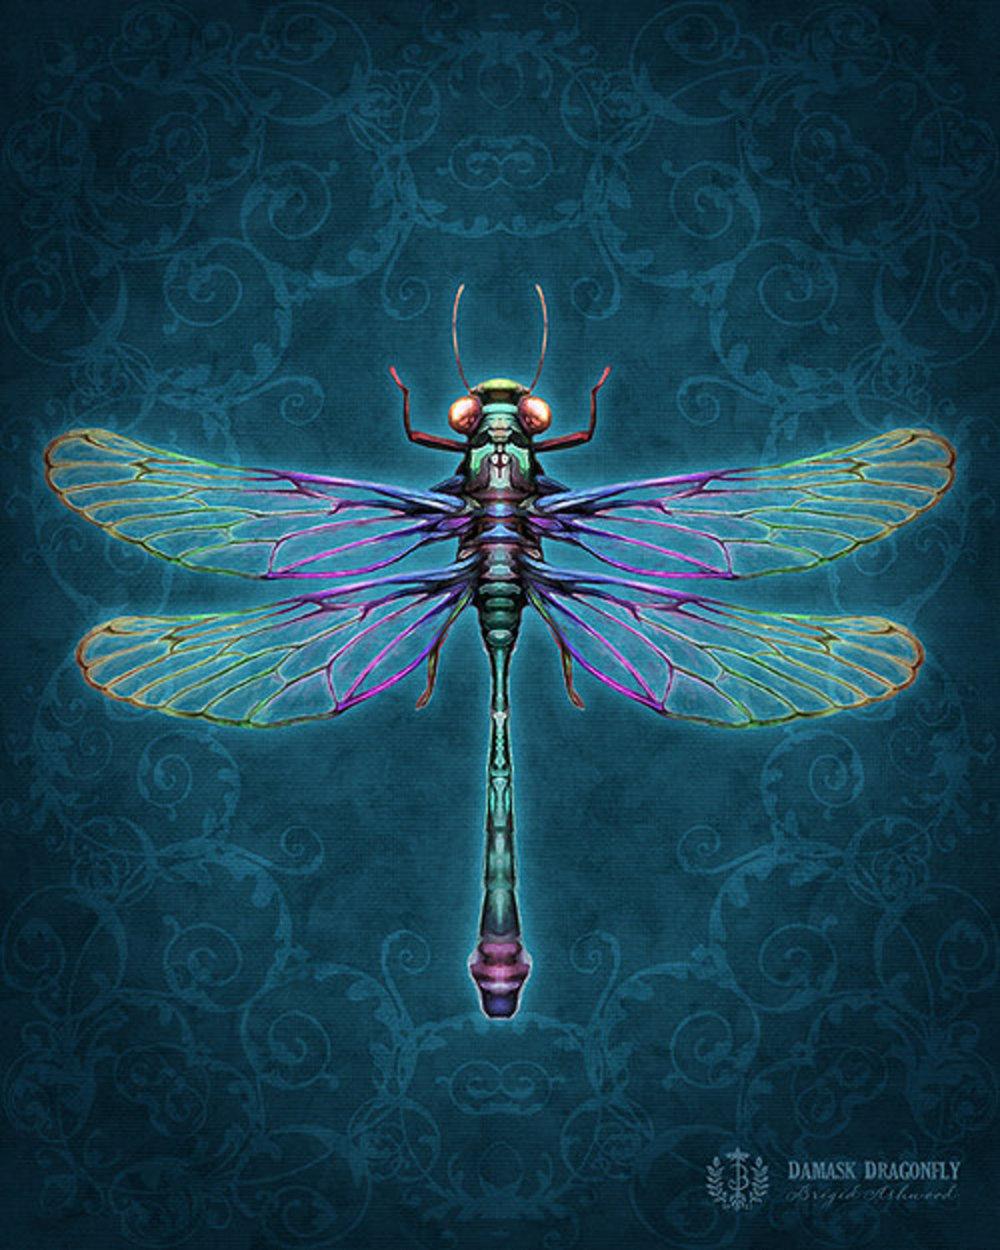 Damask Dragonfly